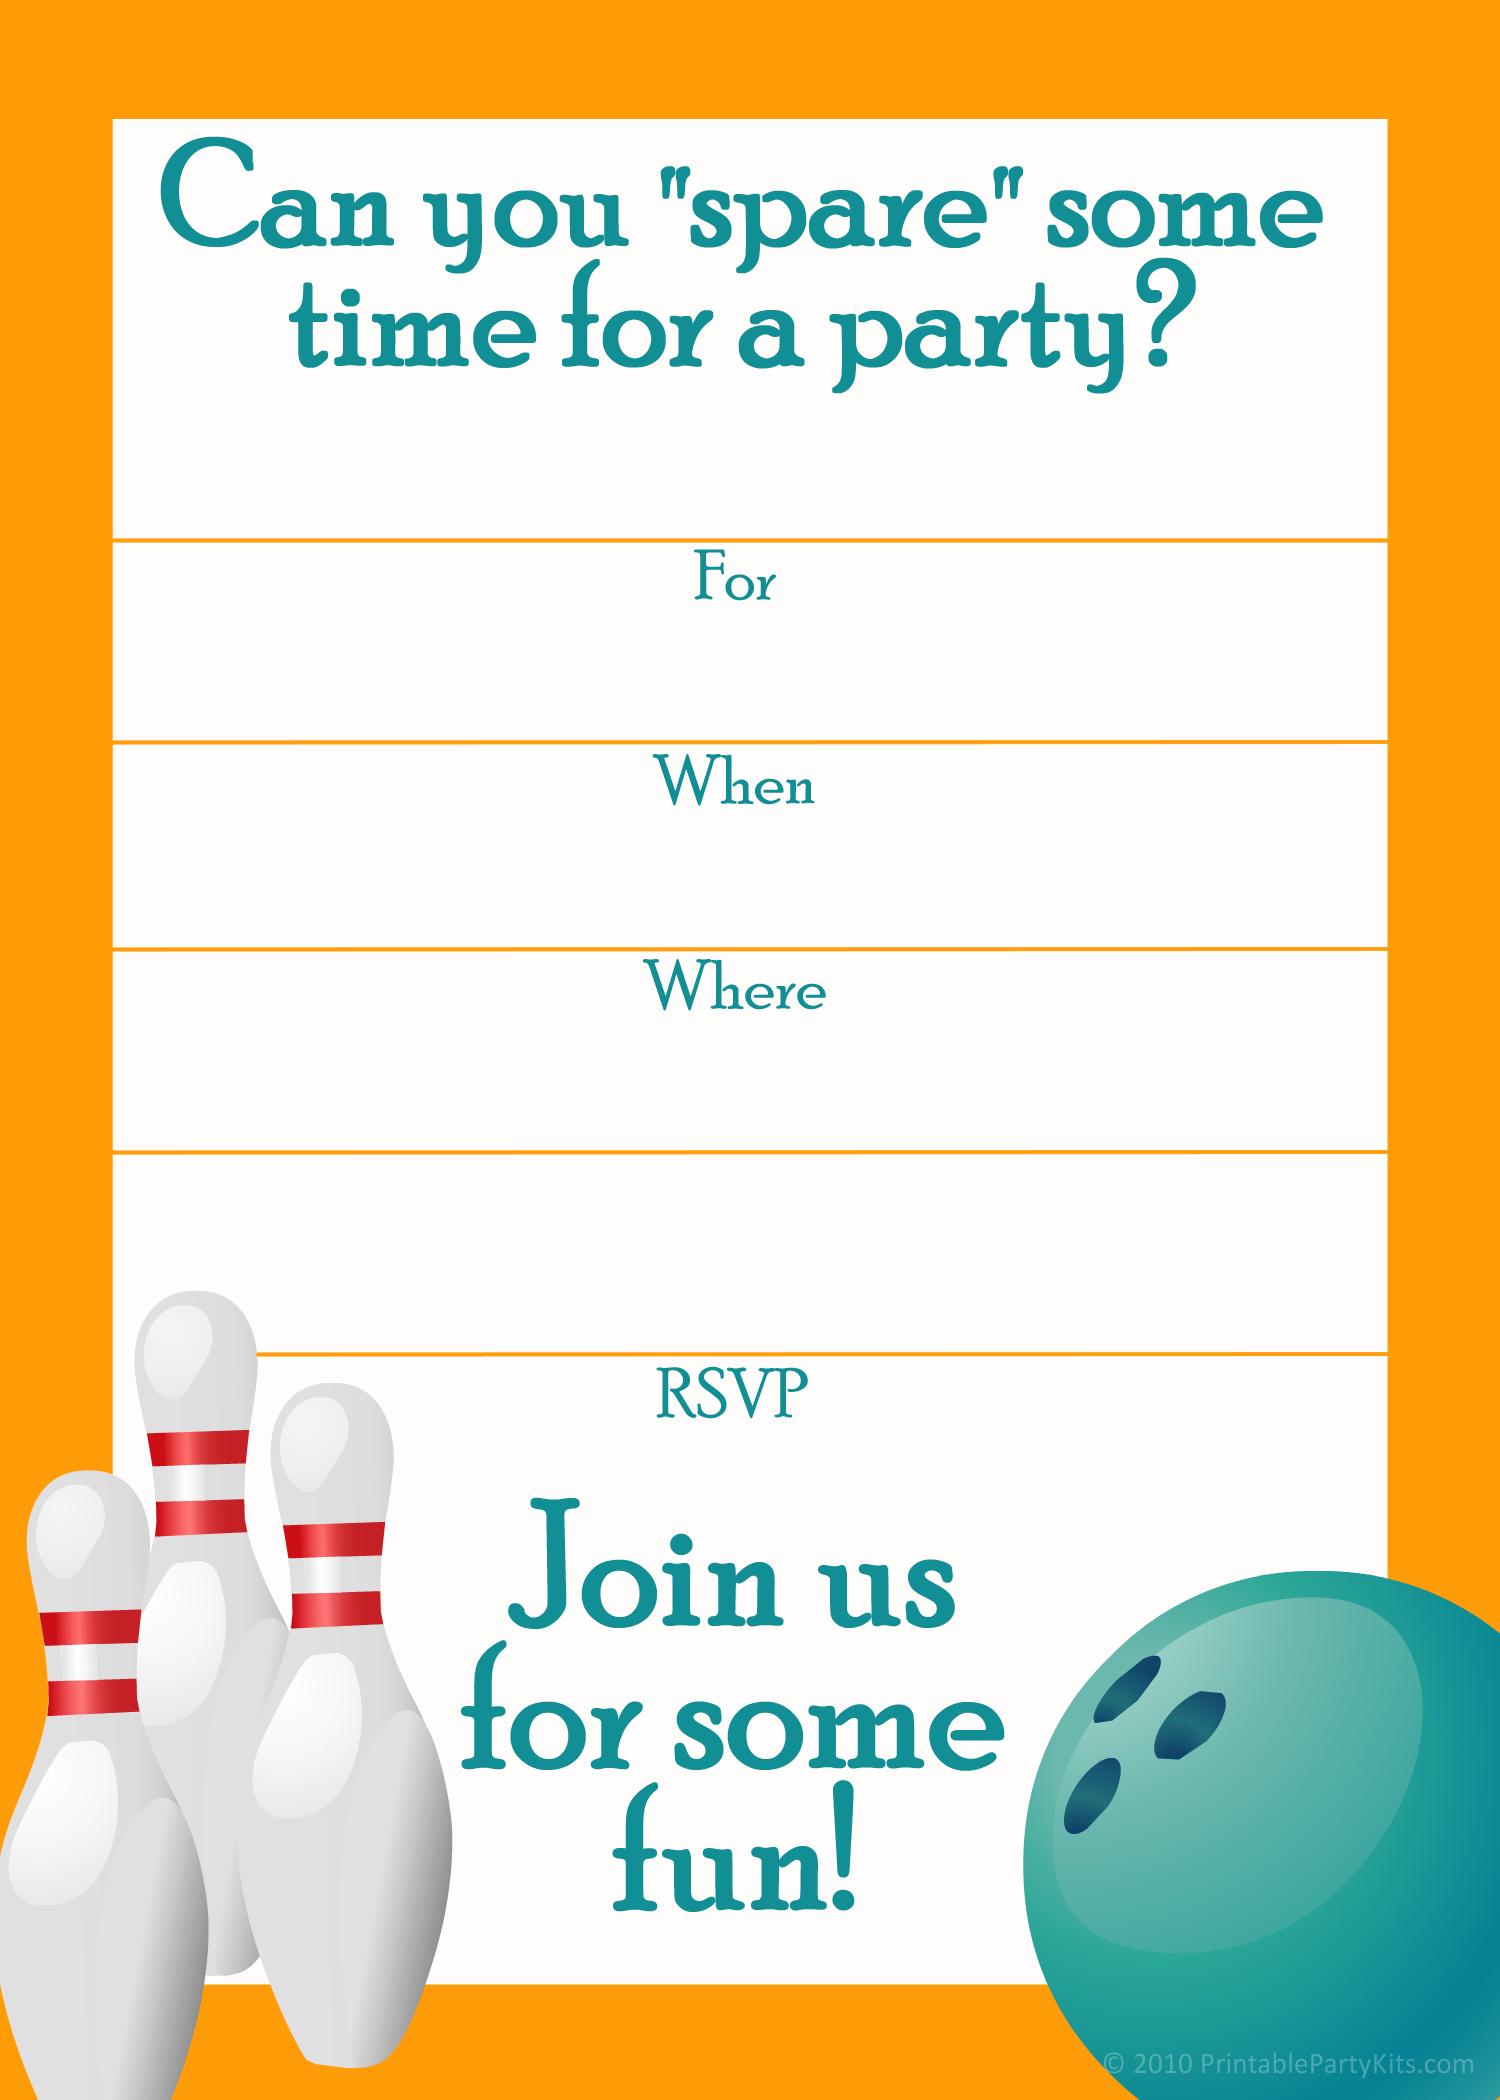 Free Printable Sports Birthday Party Invitations Templates   Party - Free Printable Bowling Invitation Templates